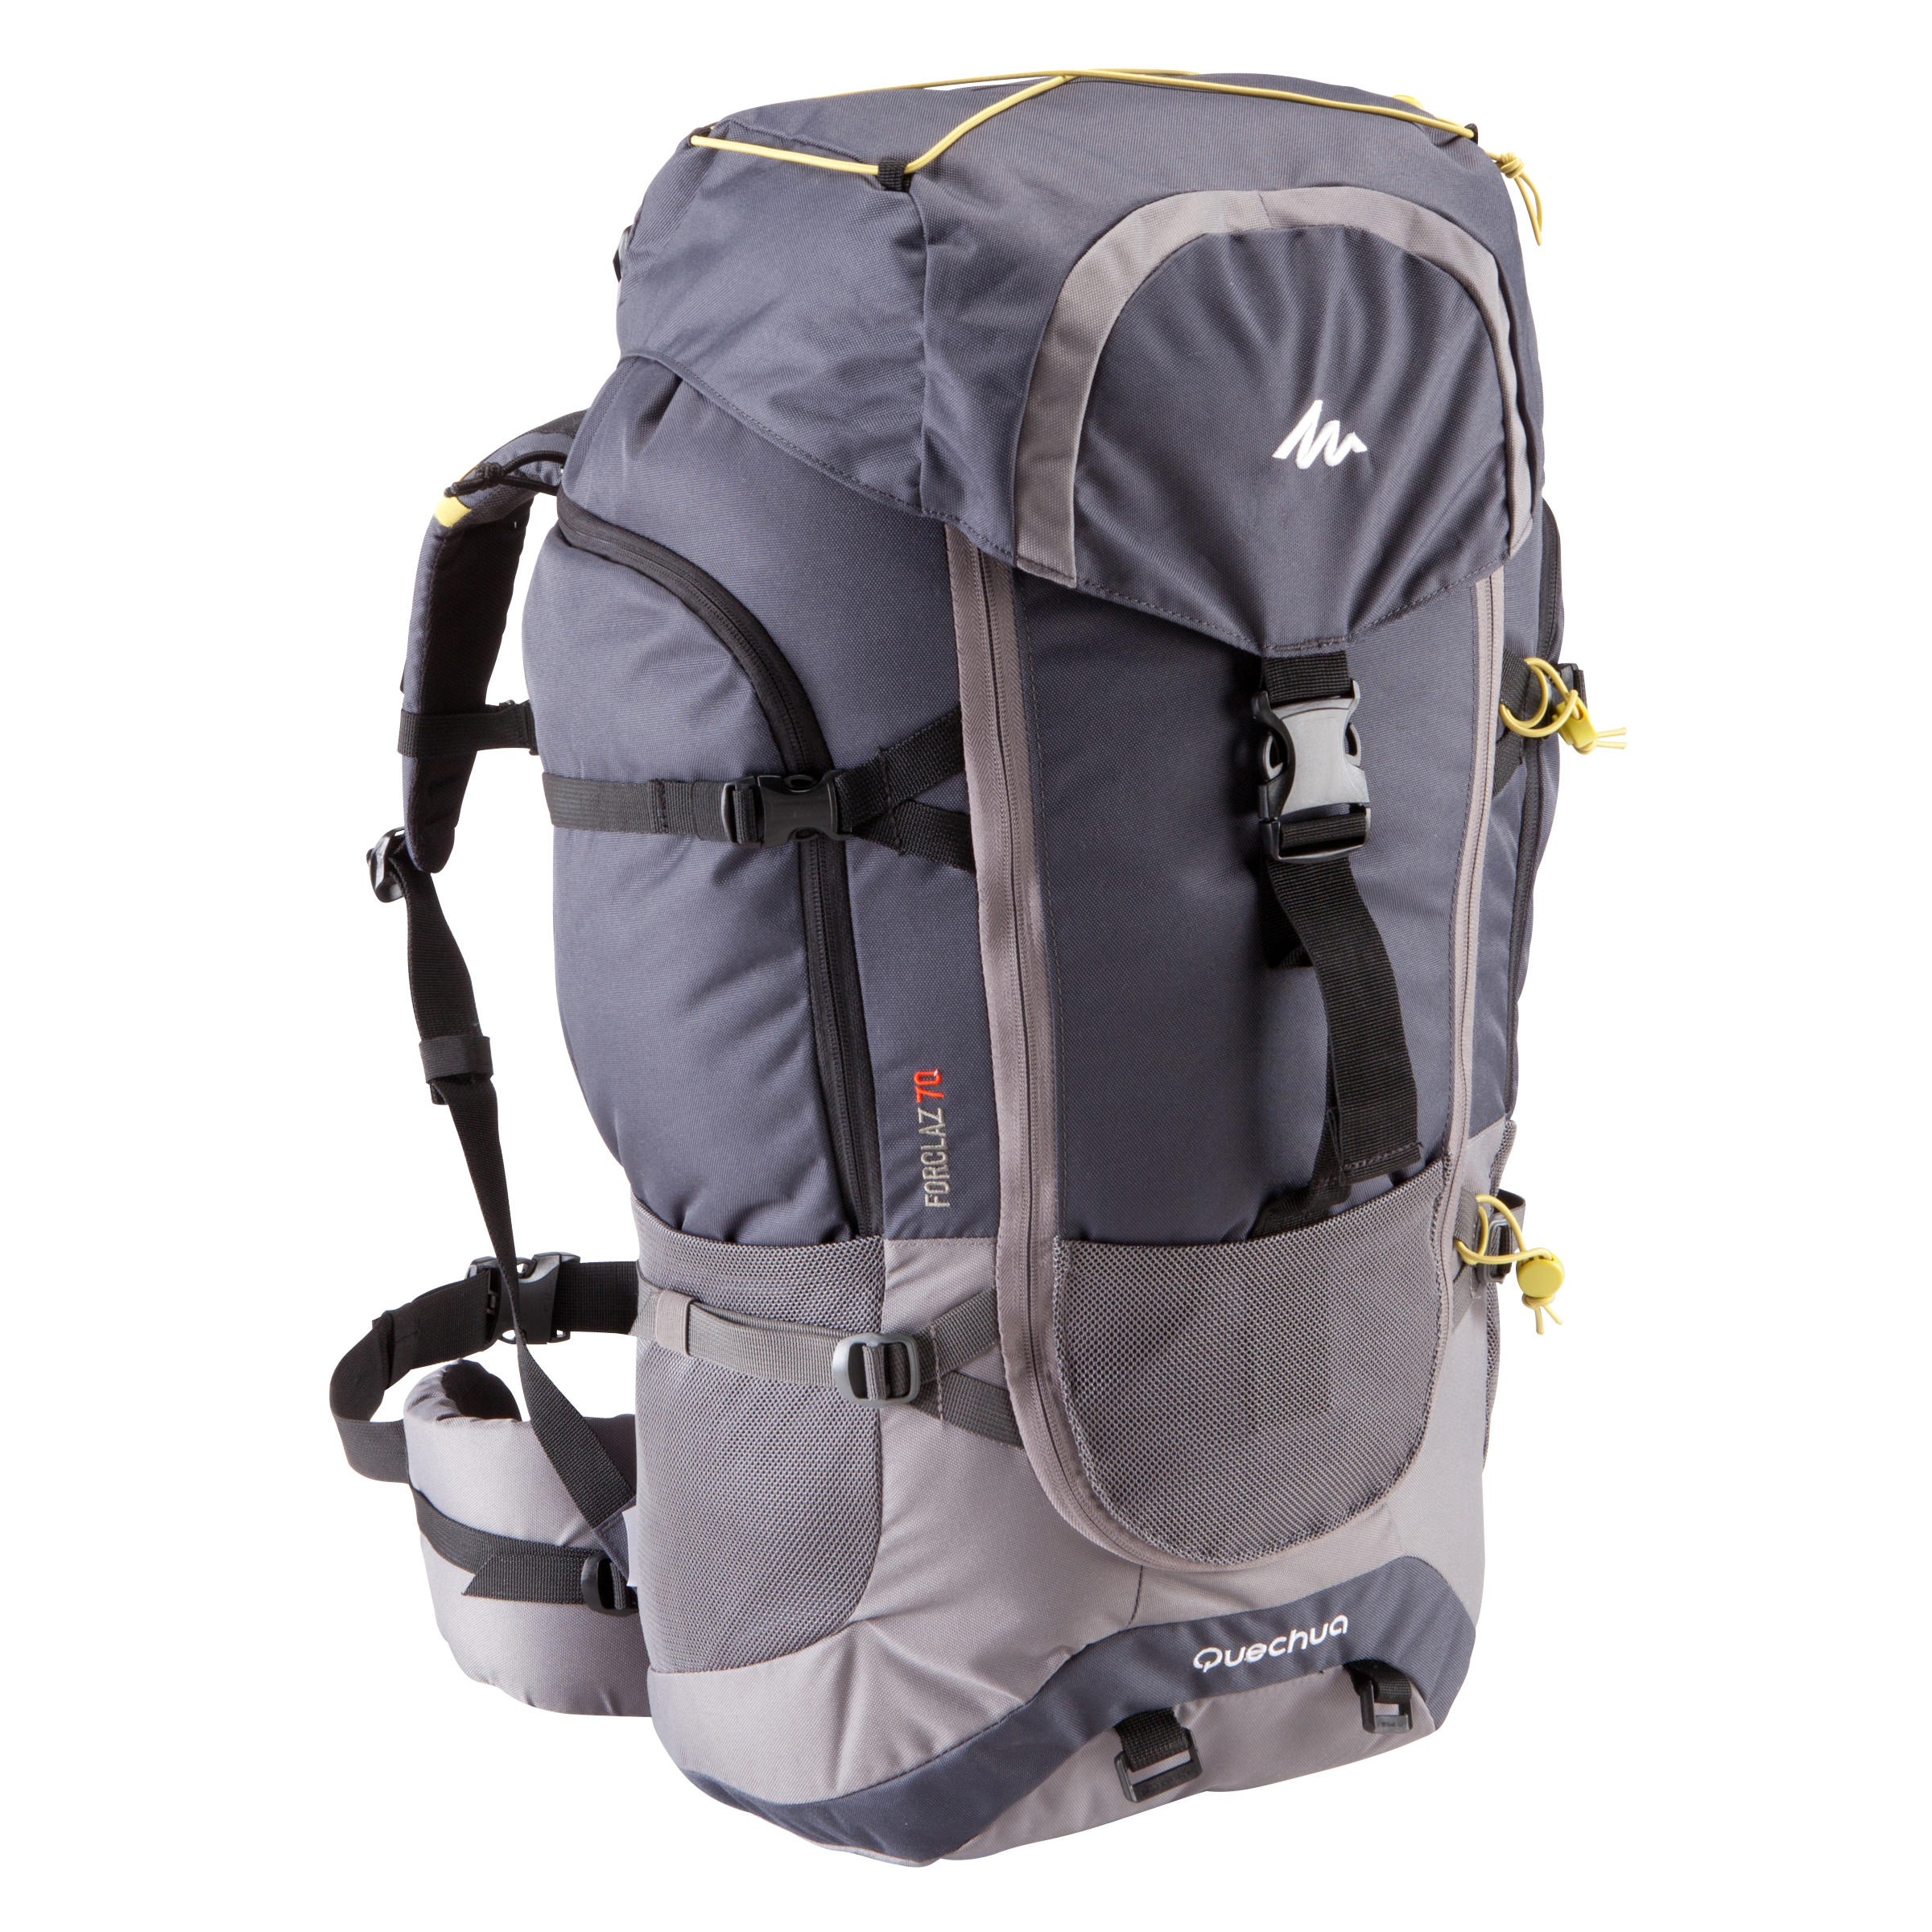 Forclaz 70 Litre Trekking Backpack - Dark Grey